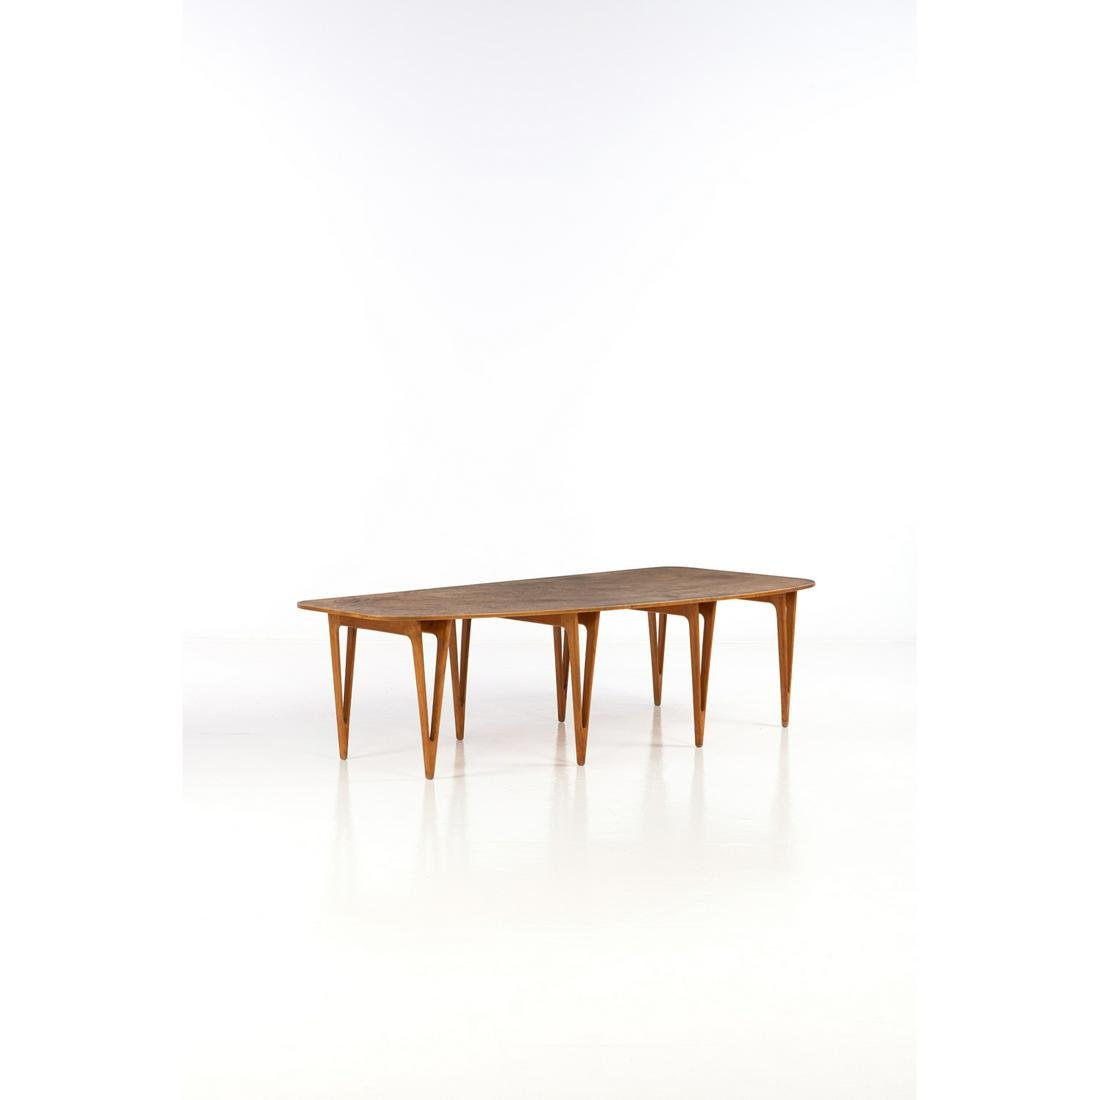 Børge Mogensen (1914-1972) Table Pine and burl